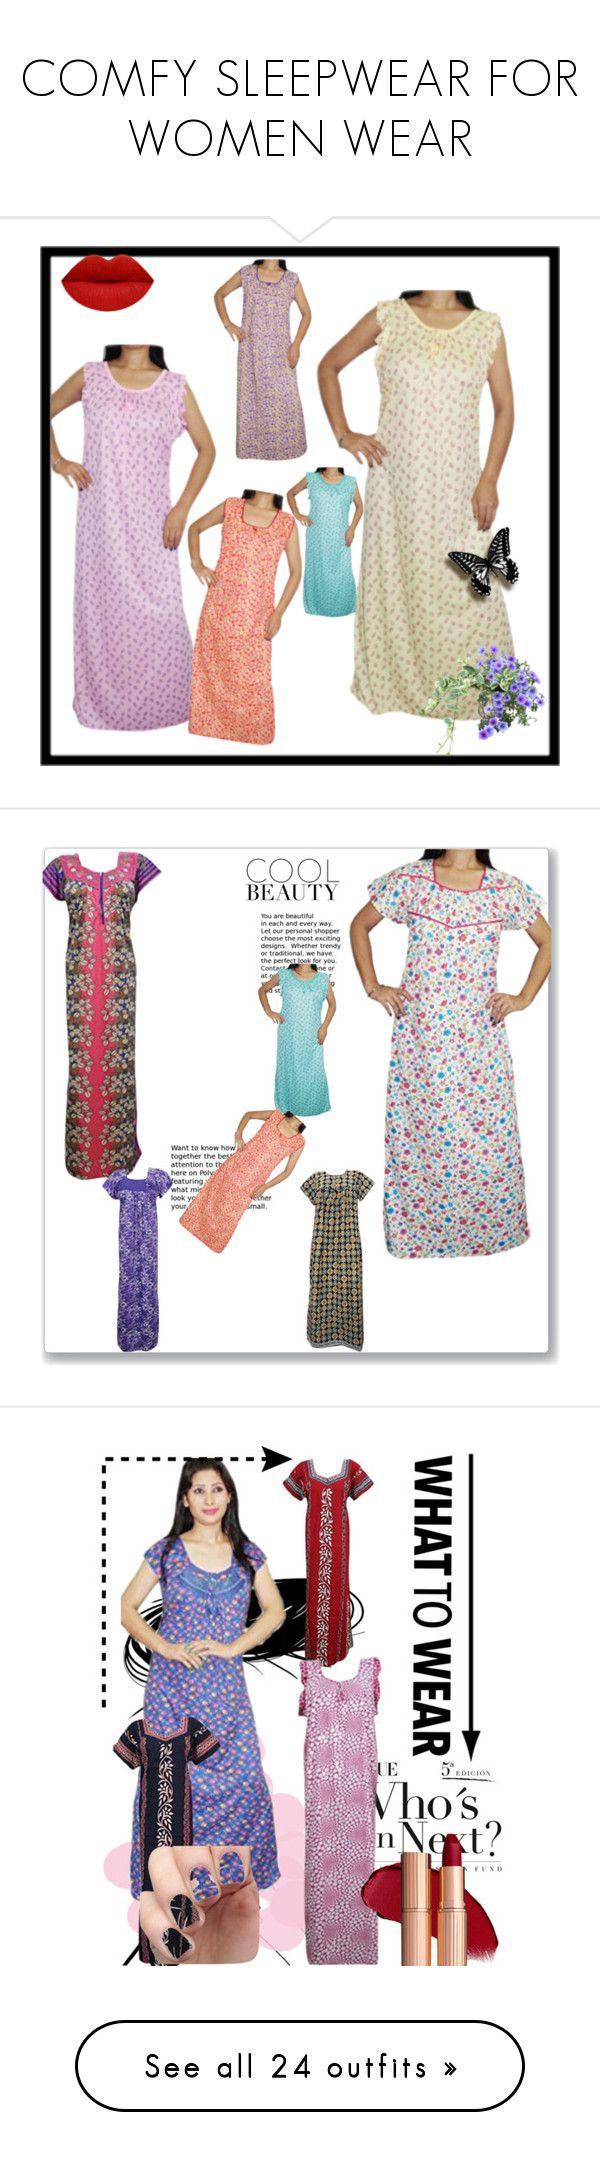 COMFY SLEEPWEAR FOR WOMEN WEAR by lavanyas-trendzs on Polyvore featuring Nightwear, Womens, nighty, nightdress, women, women's fashion, intimates, sleepwear, nightgowns and pink sleepwear  http://www.polyvore.com/cgi/collection?id=5907433  #maxi #nightgown #sleepwear #women #fashion #comfy #honeymoonwear